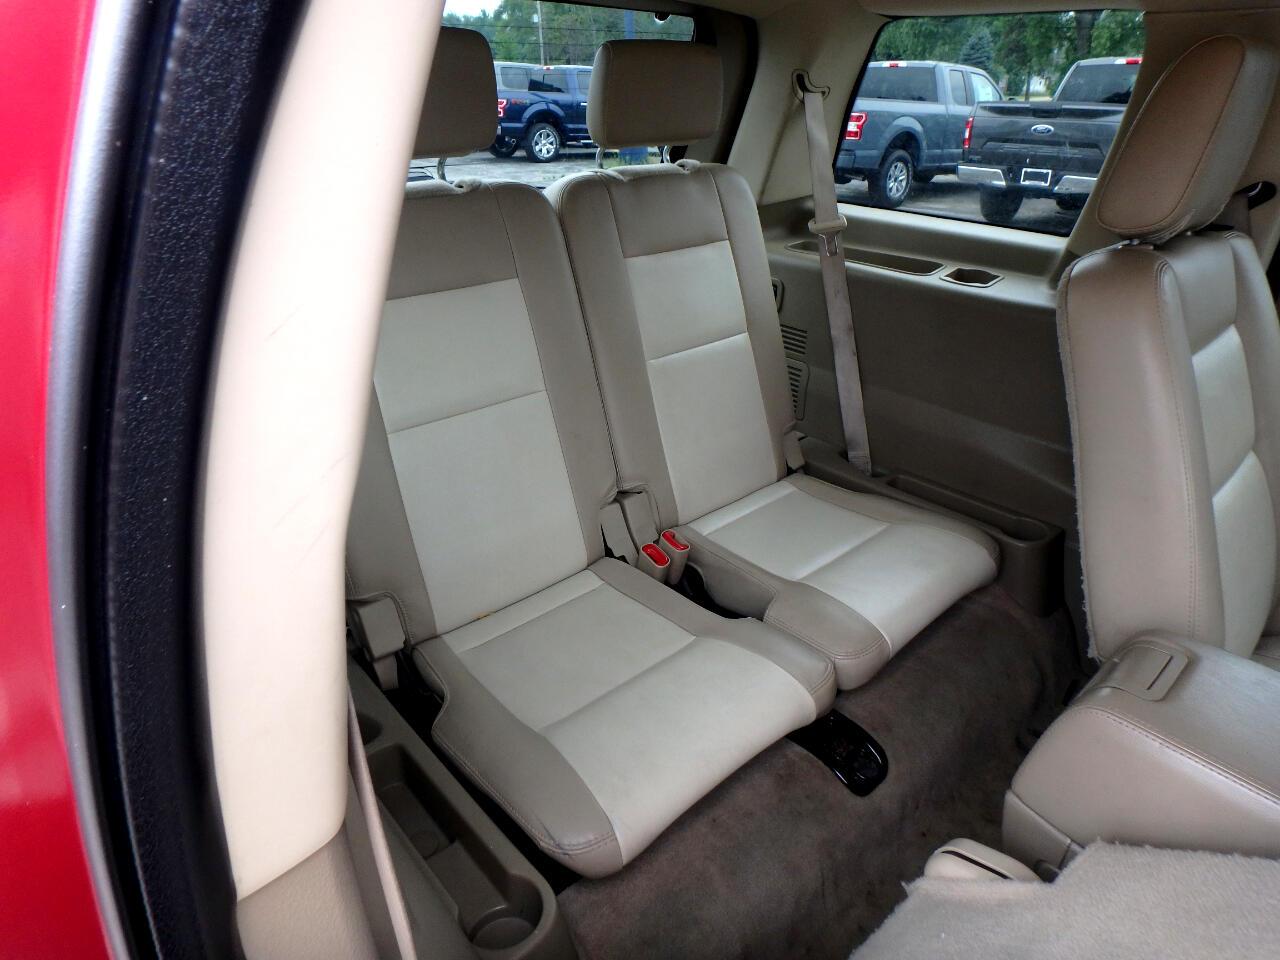 Mercury Mountaineer AWD 4dr V8 Premier 2007